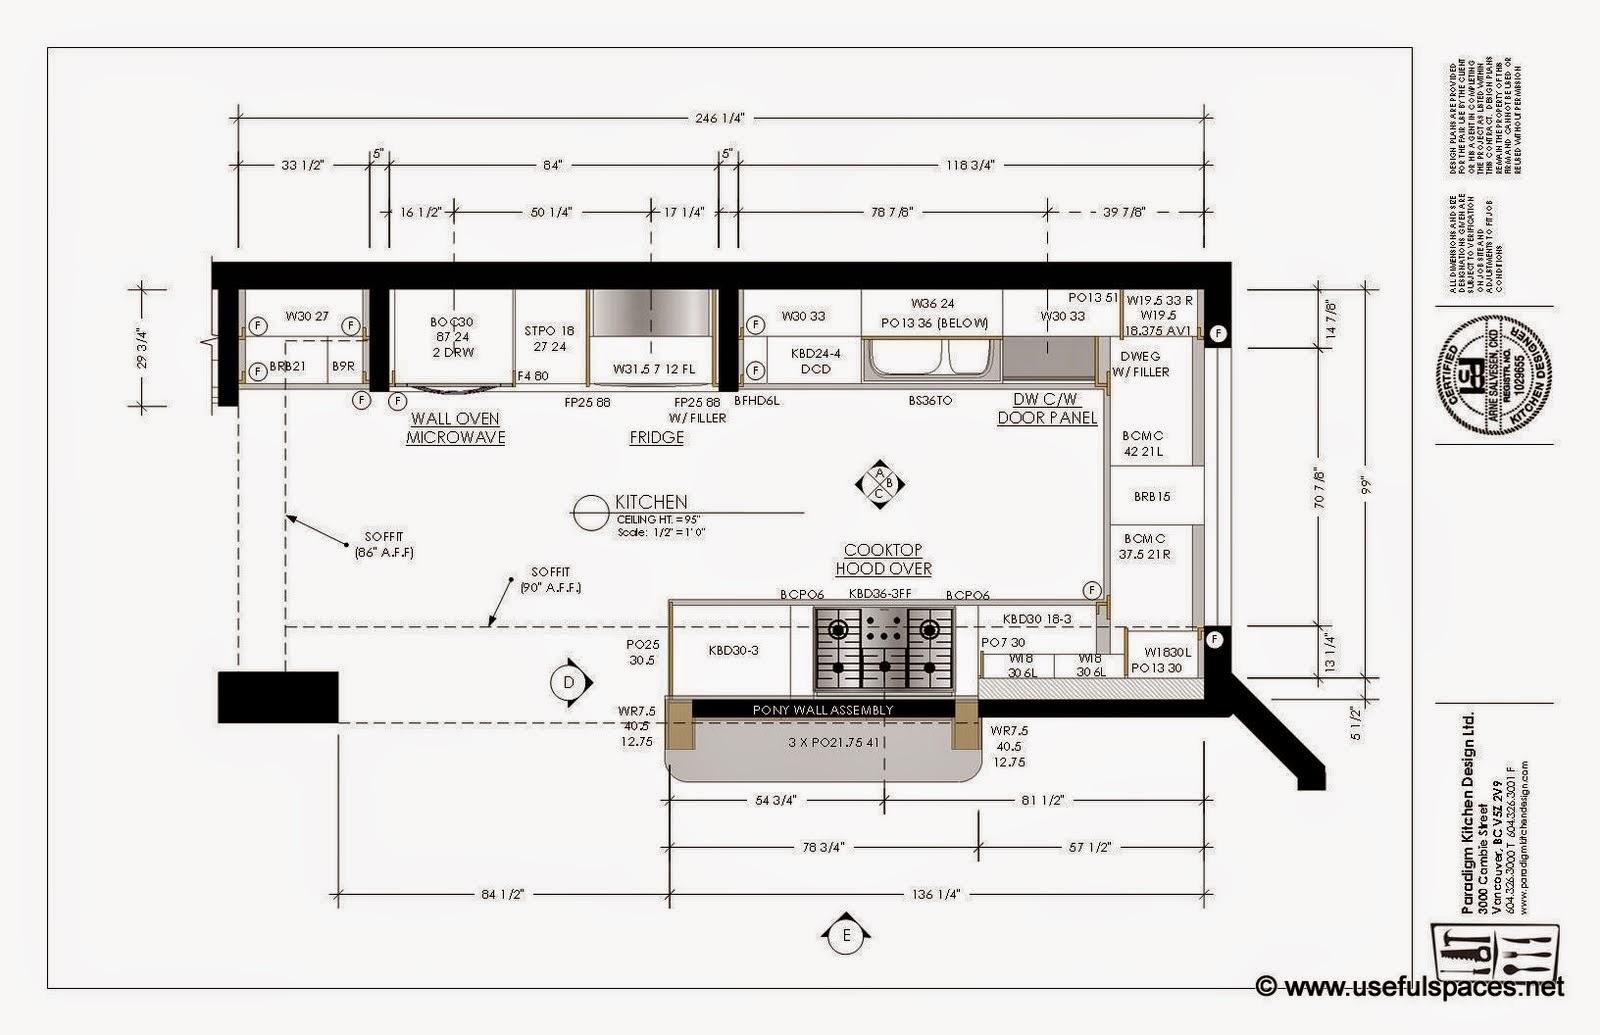 Kitchen Ideas - dumitruiandra: how to design a kitchen layout